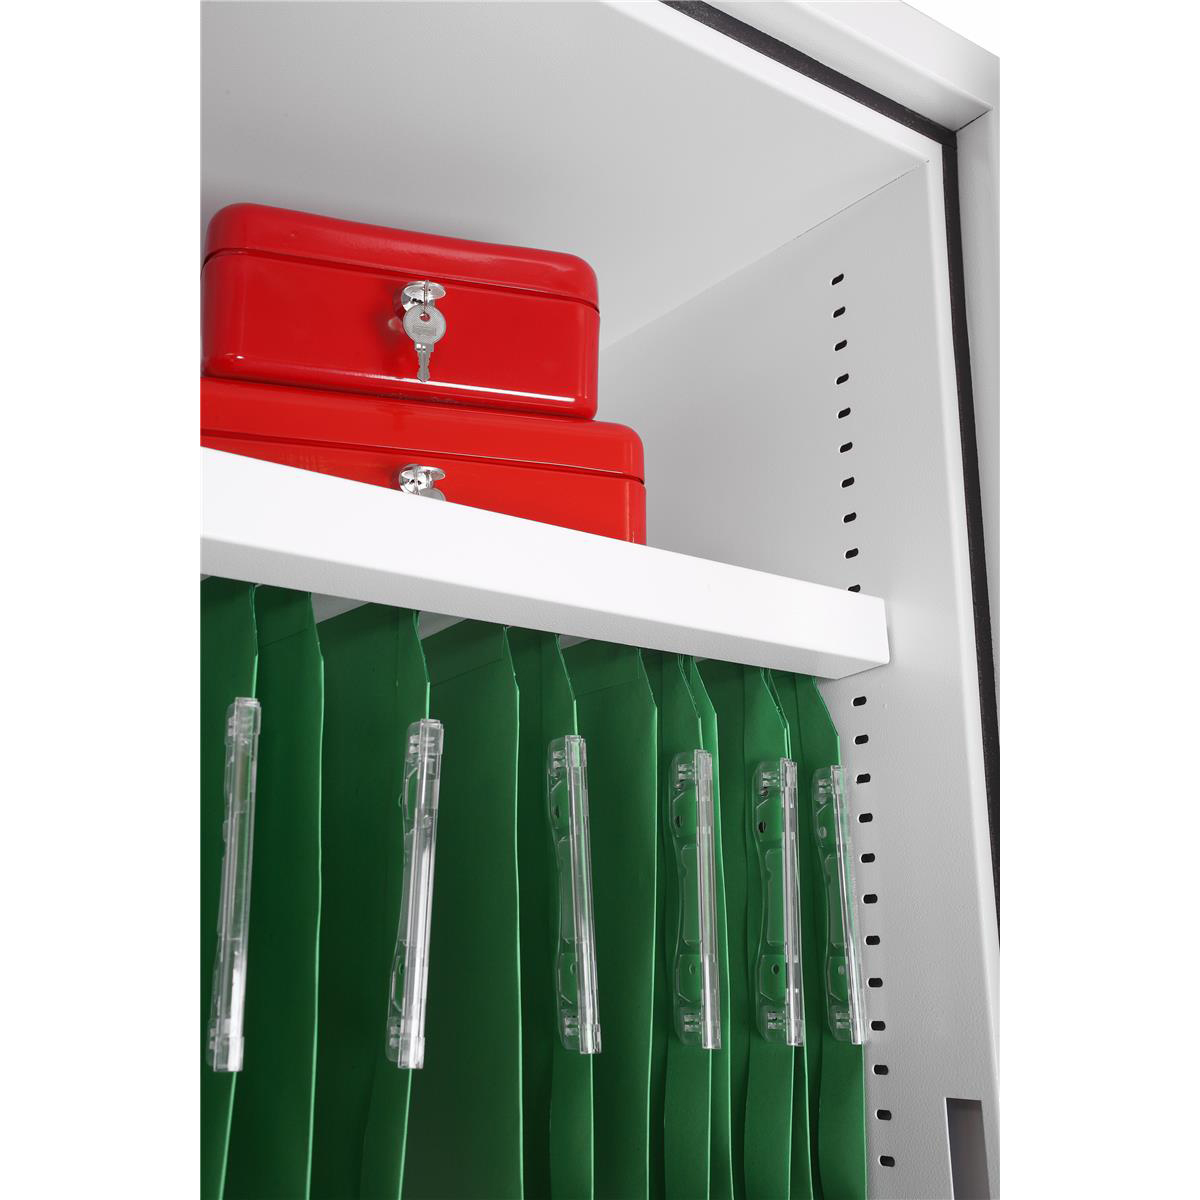 Phoenix Fire Ranger Steel Storage Cupboard Fire and Burglary Resistant W935xD520x1225mm Ref FS1512K